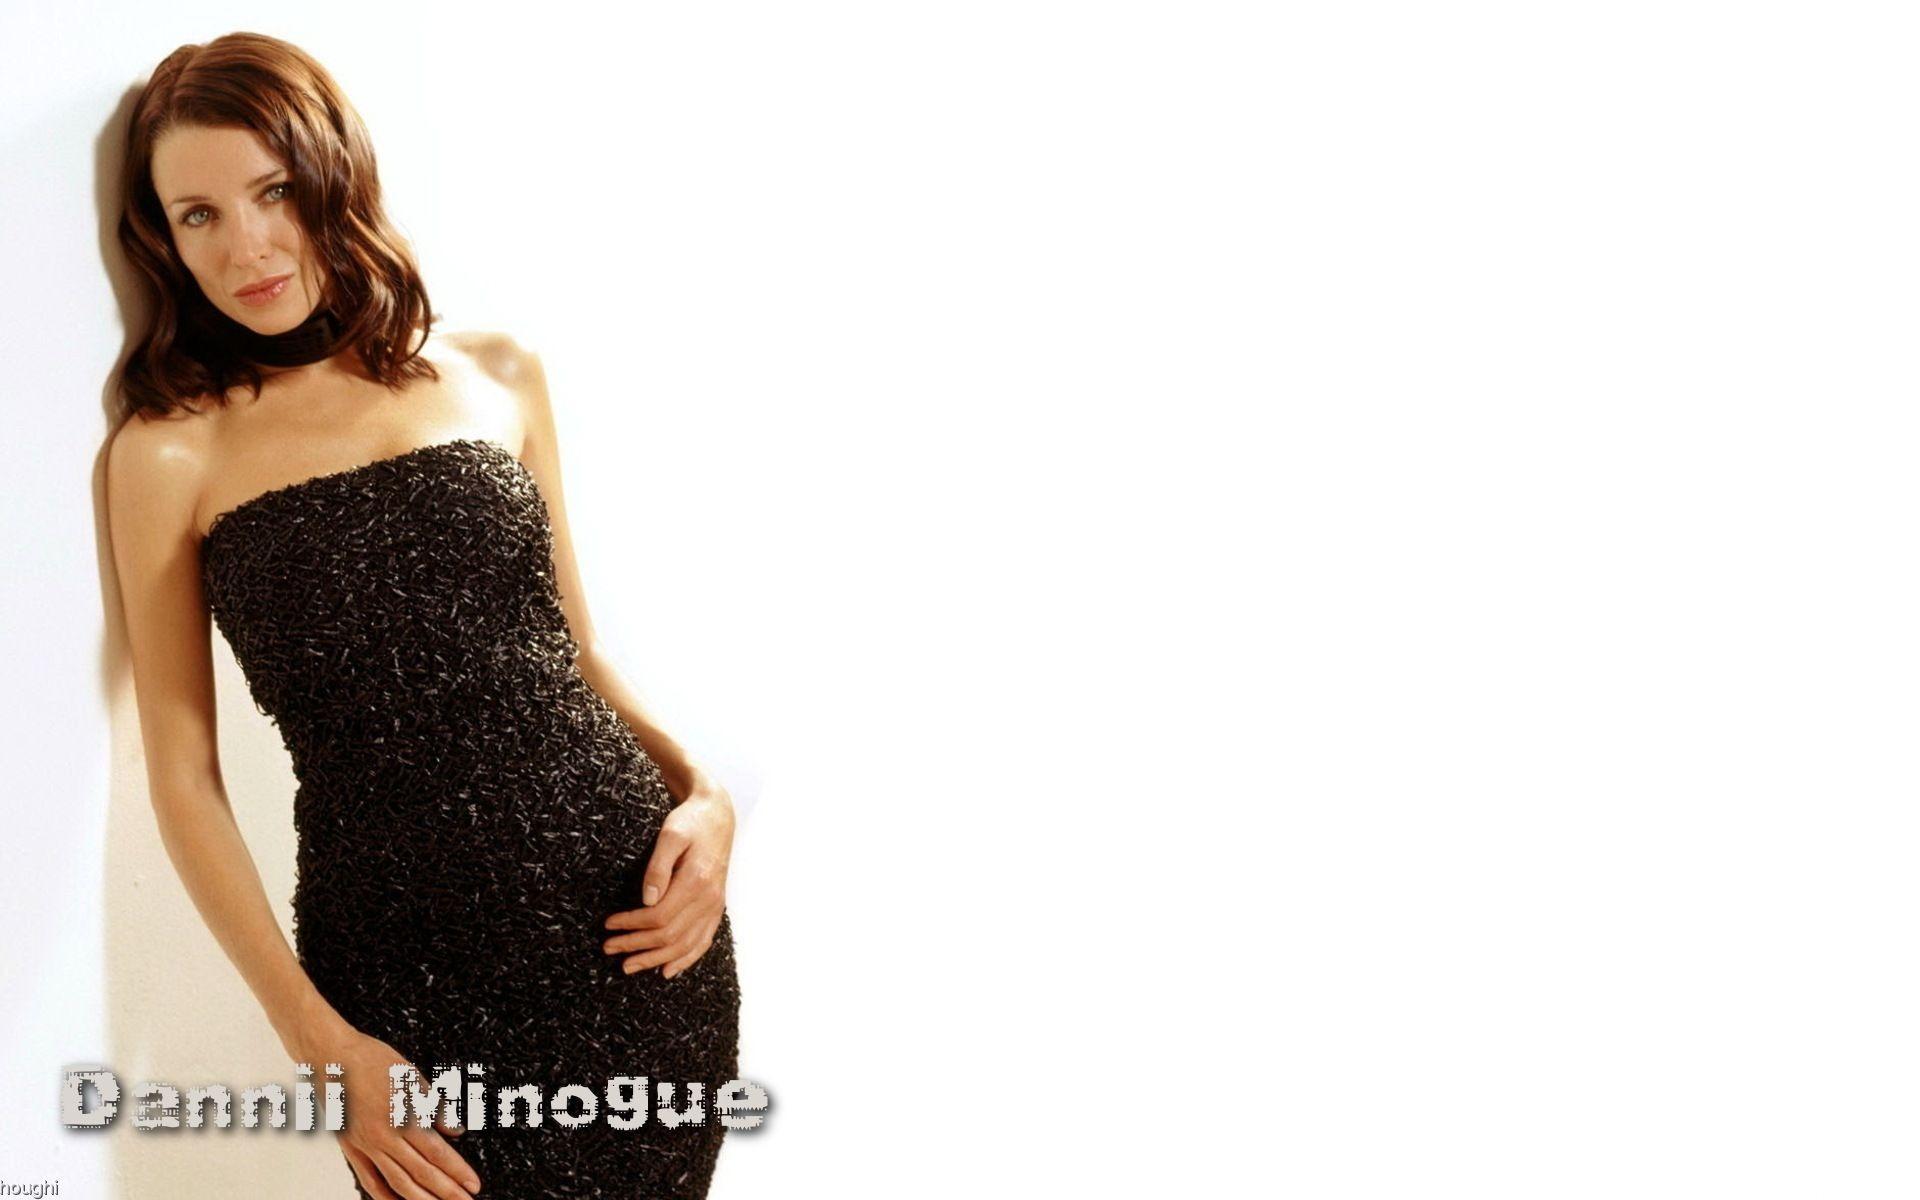 Dannii Minogue 052  1920x1200 Wallpaper Download